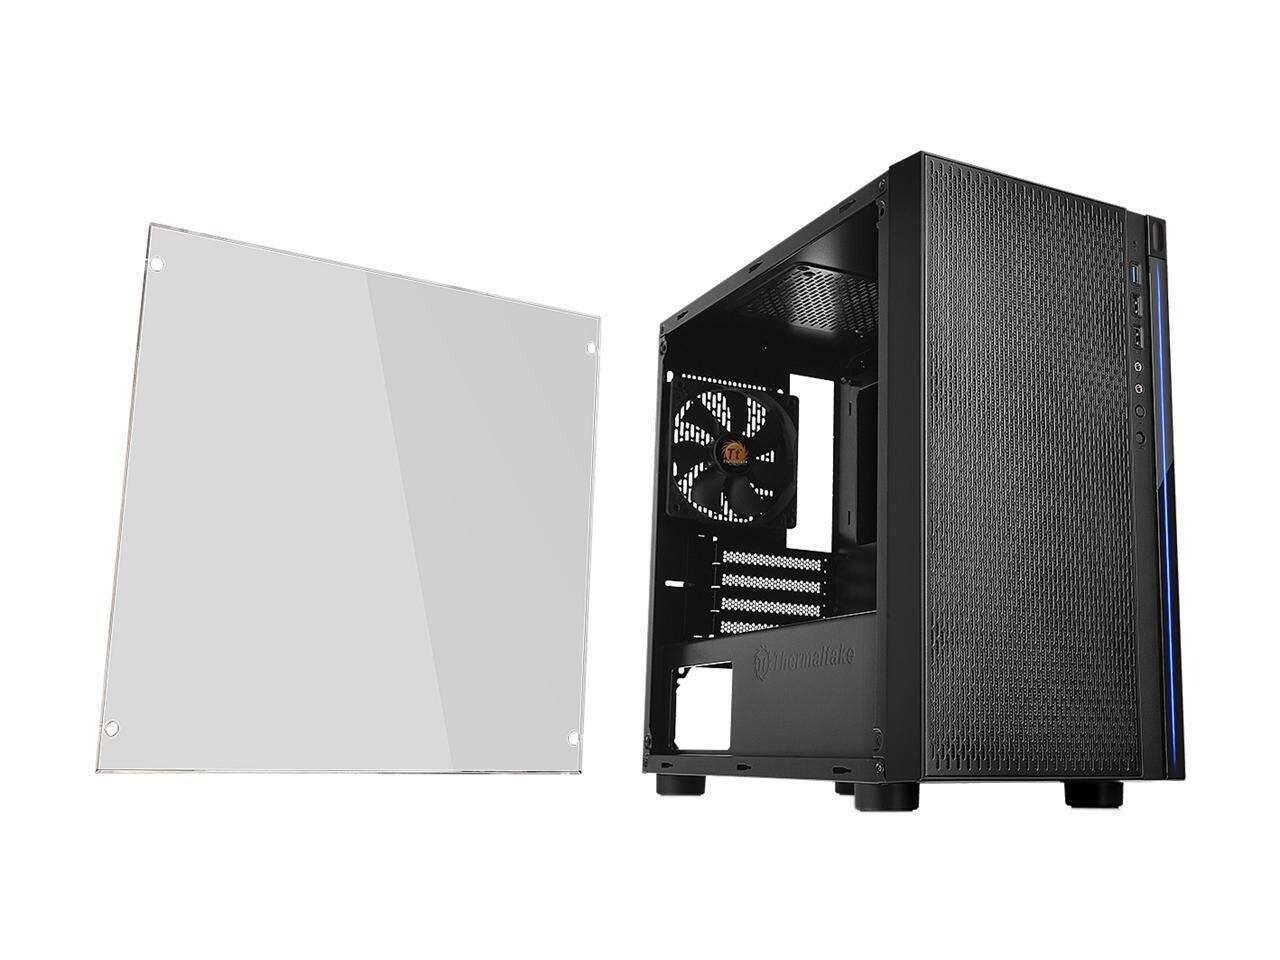 Thermaltake Versa H18 Tempered Glass Black SPCC Micro ATX Gaming Computer Case